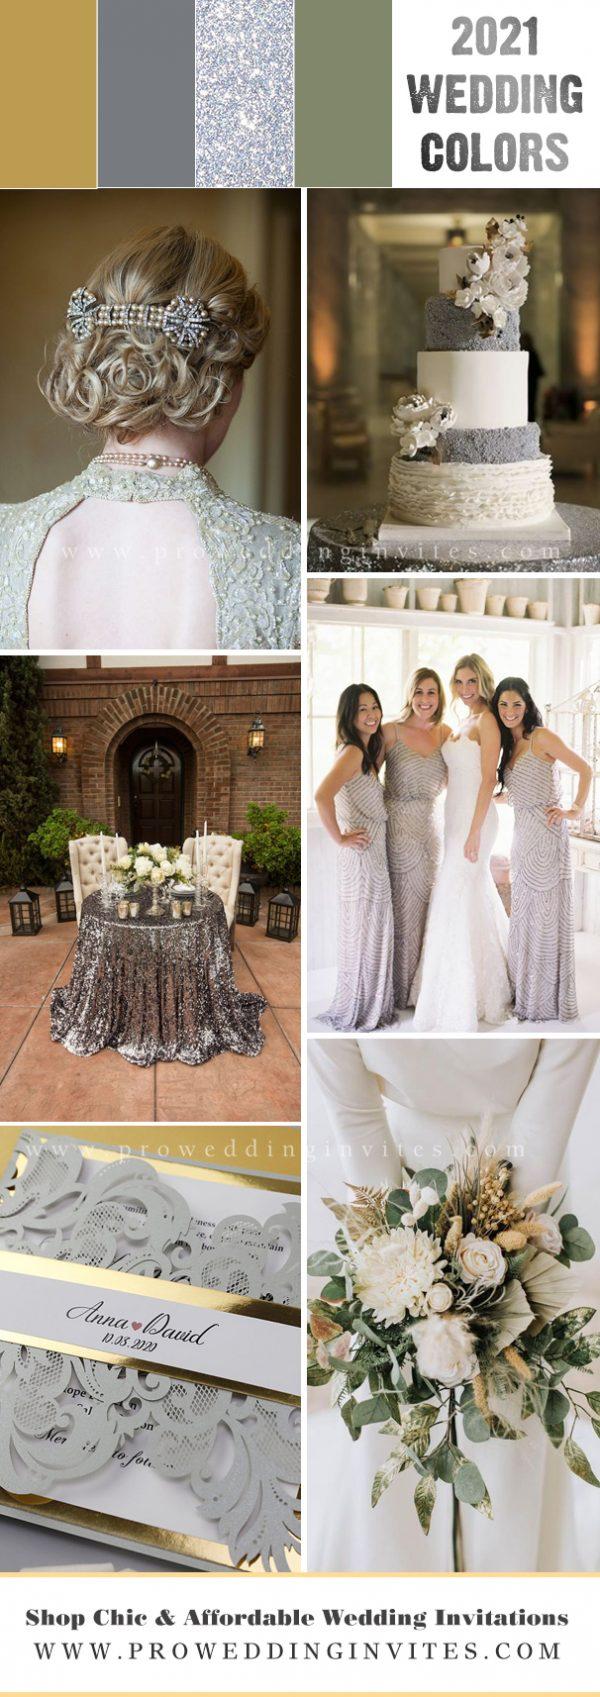 2021 Modern & Minimalist Greenery Wedding Color Palette